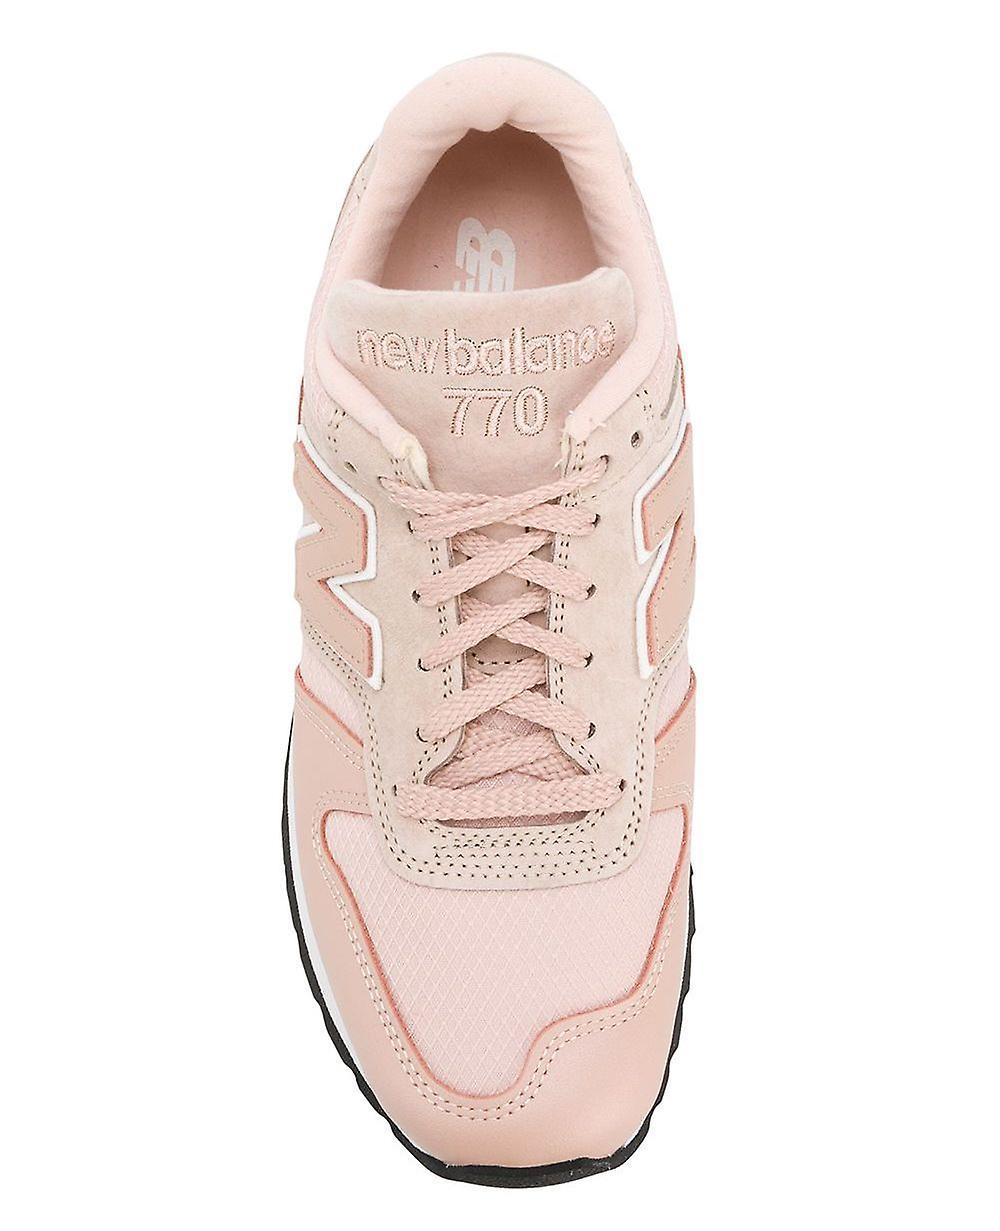 770 Made in England Sneakers - Gratis frakt